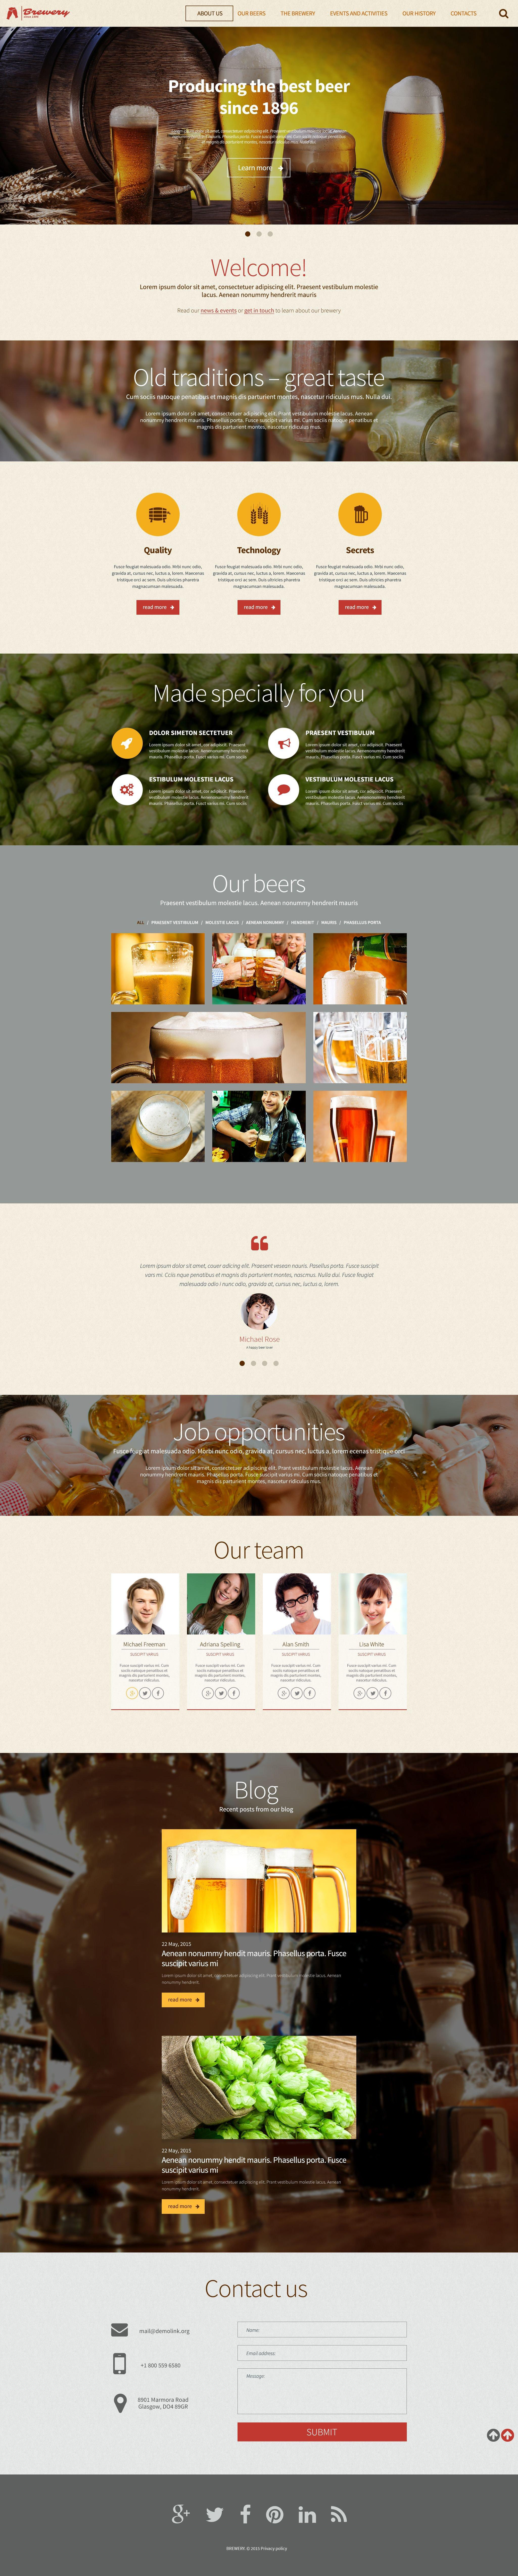 """Brewery"" - адаптивний WordPress шаблон №55486"